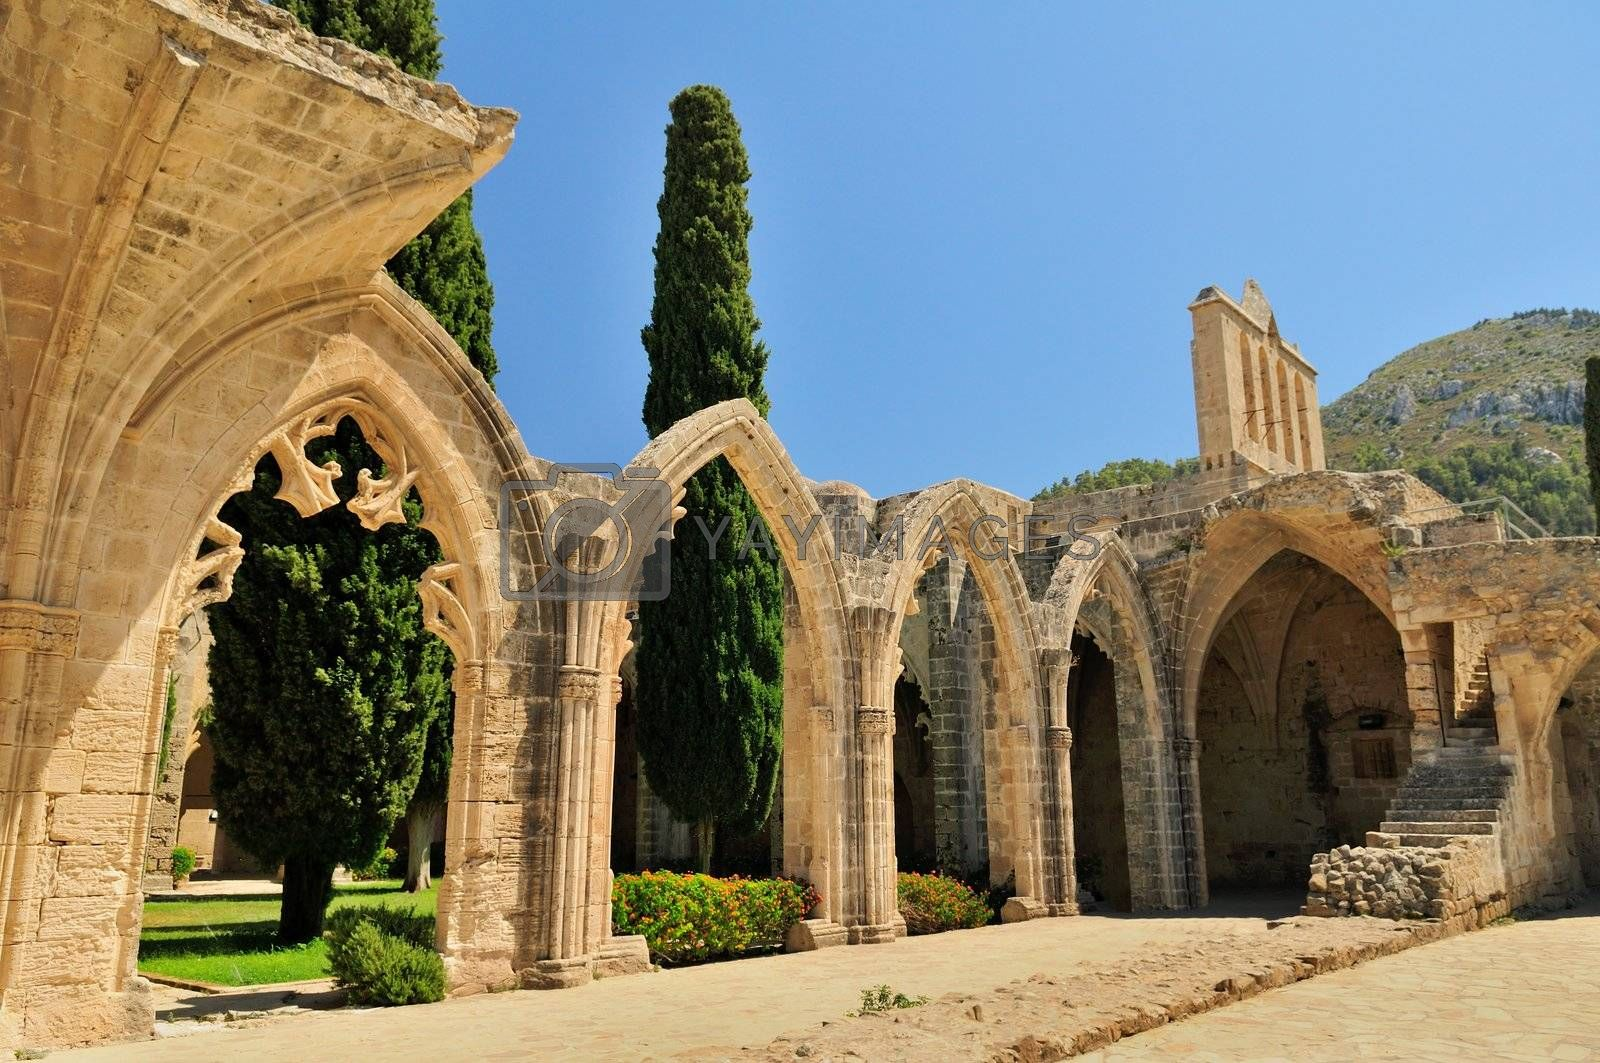 Bellapais Abbey Monastery in Kyrenia. Turkish side of the island of Cyprus.